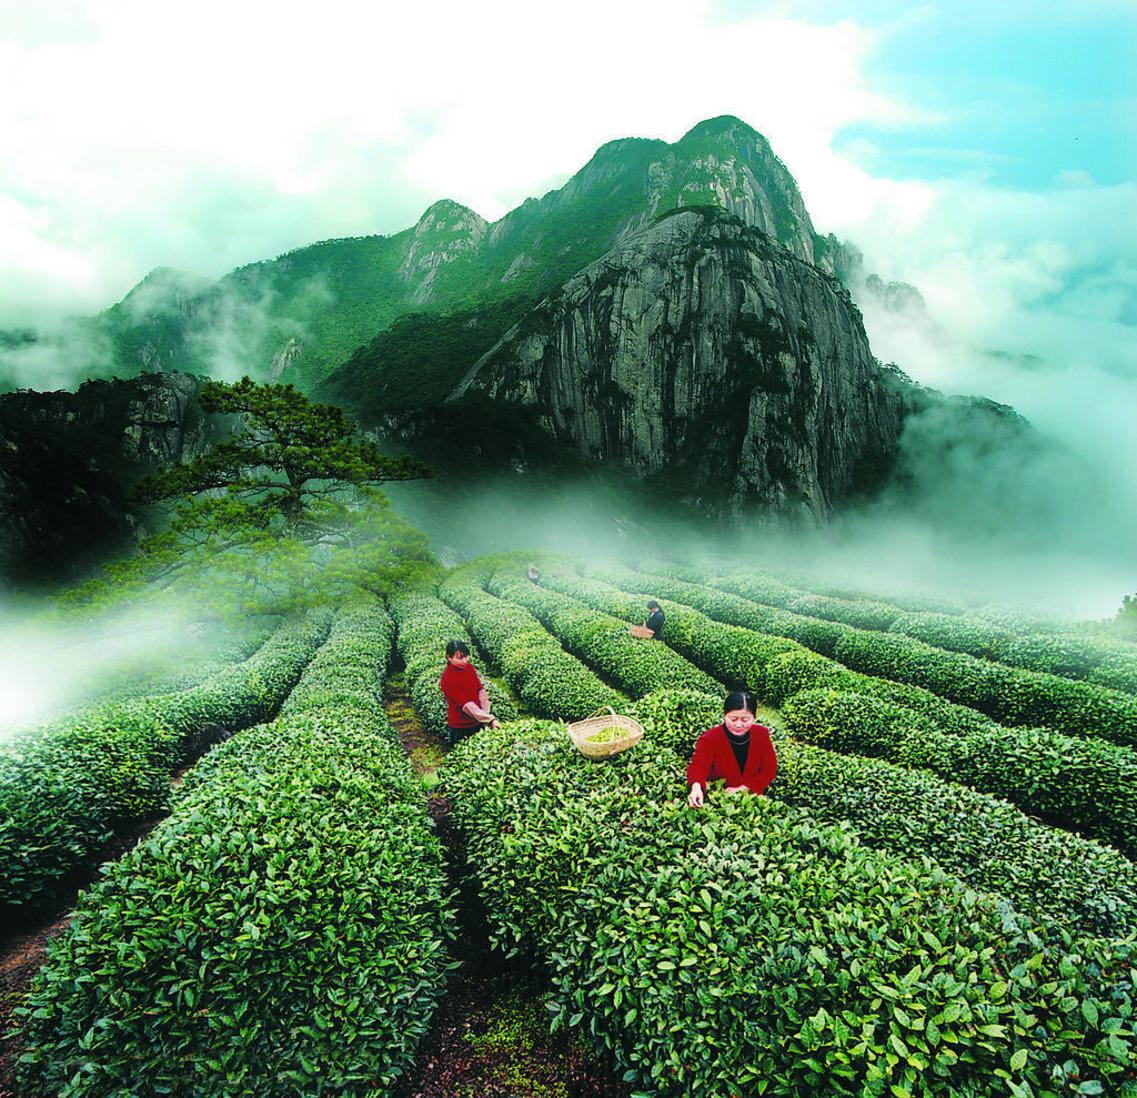 Gathering Tea in the Wuyi Mountains, Fujian Province